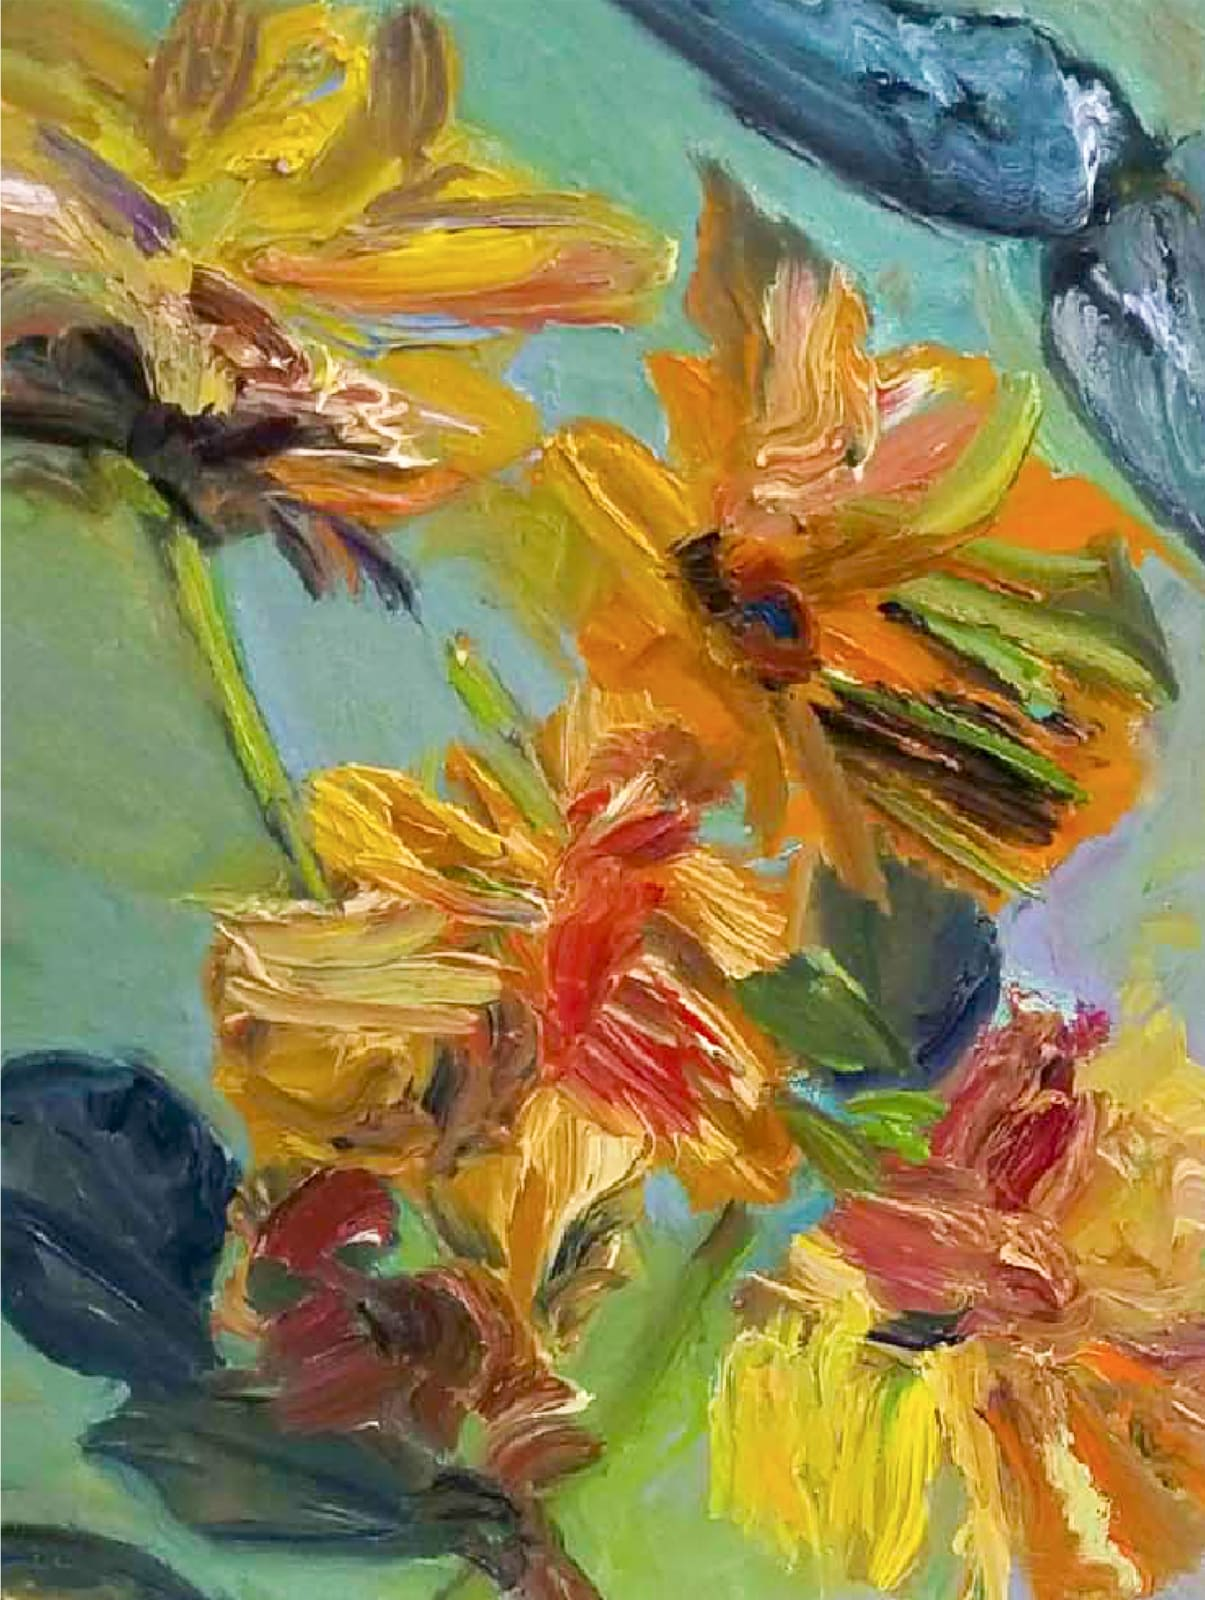 Pamela Davis Kivelson, #22 Angry Sunflowers 1, 2020